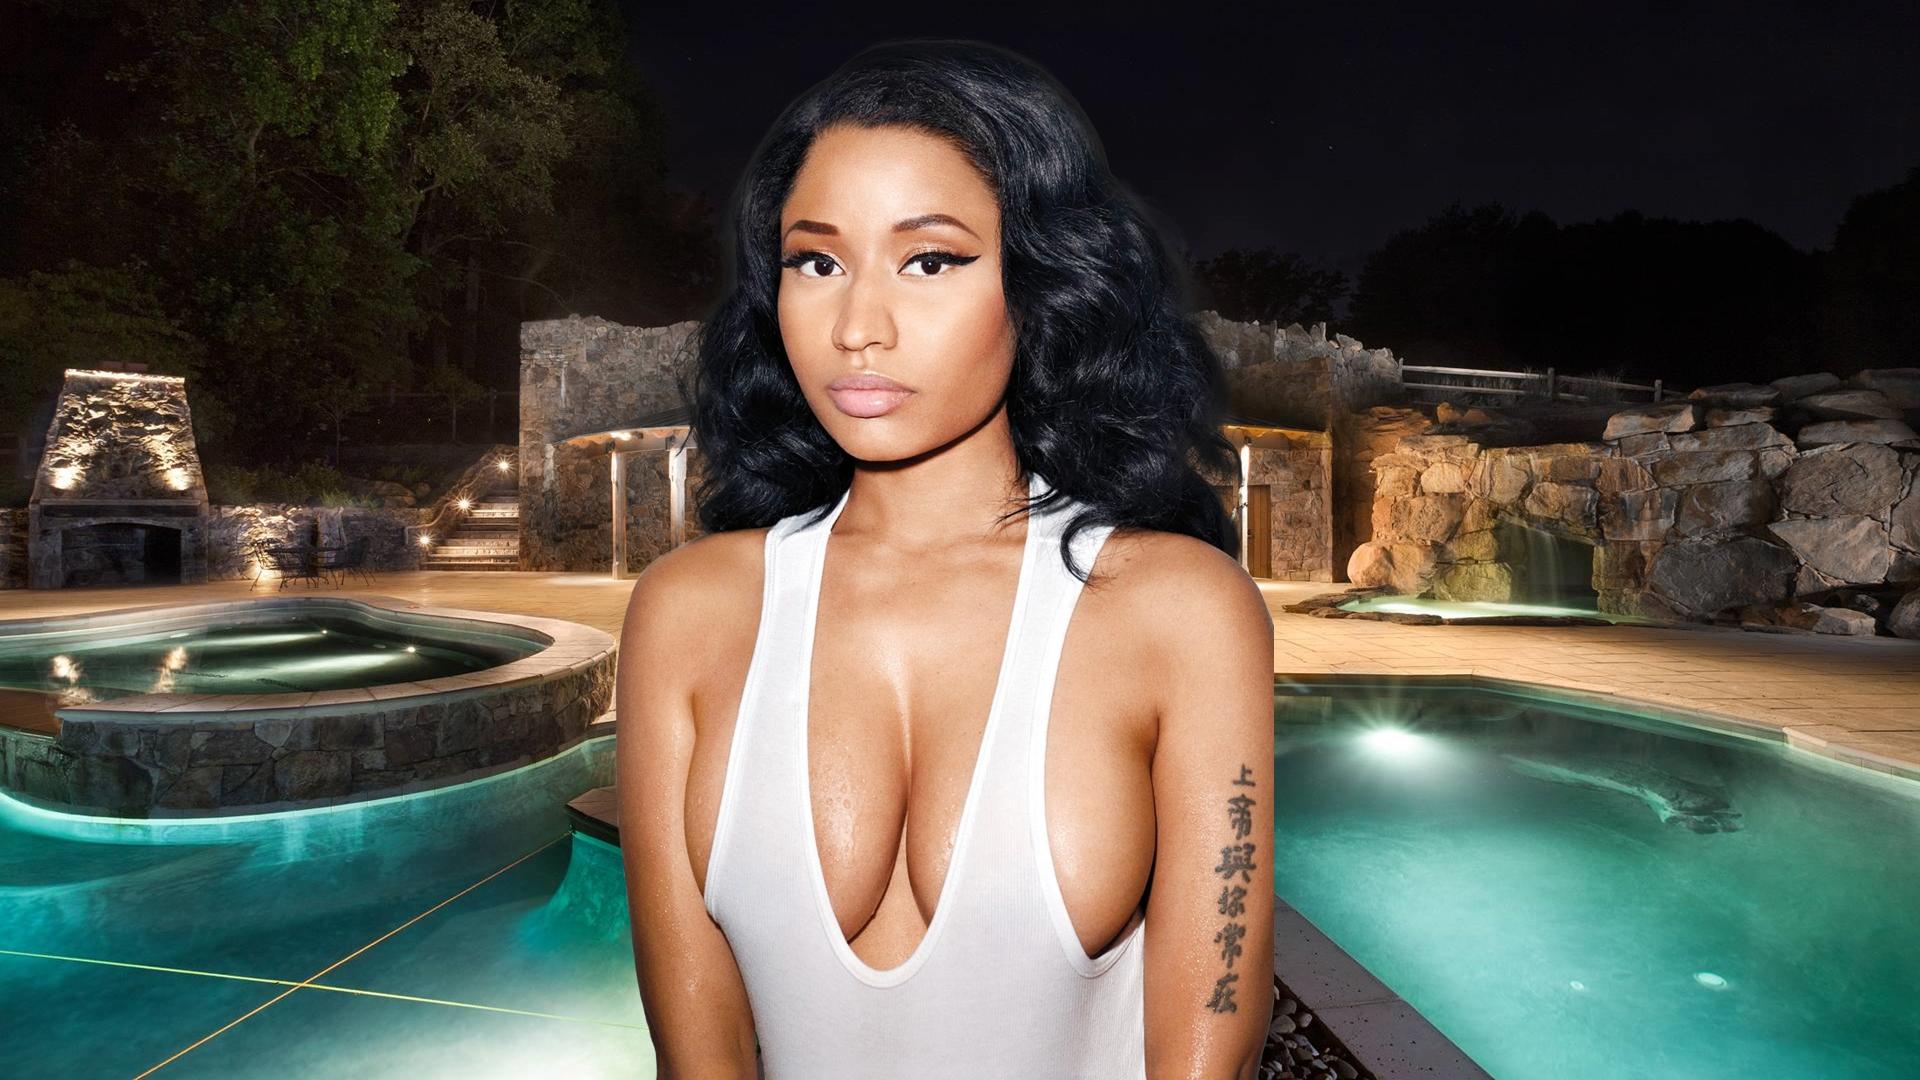 Nicki Minaj 2015 HD desktop wallpaper : High Definition ...